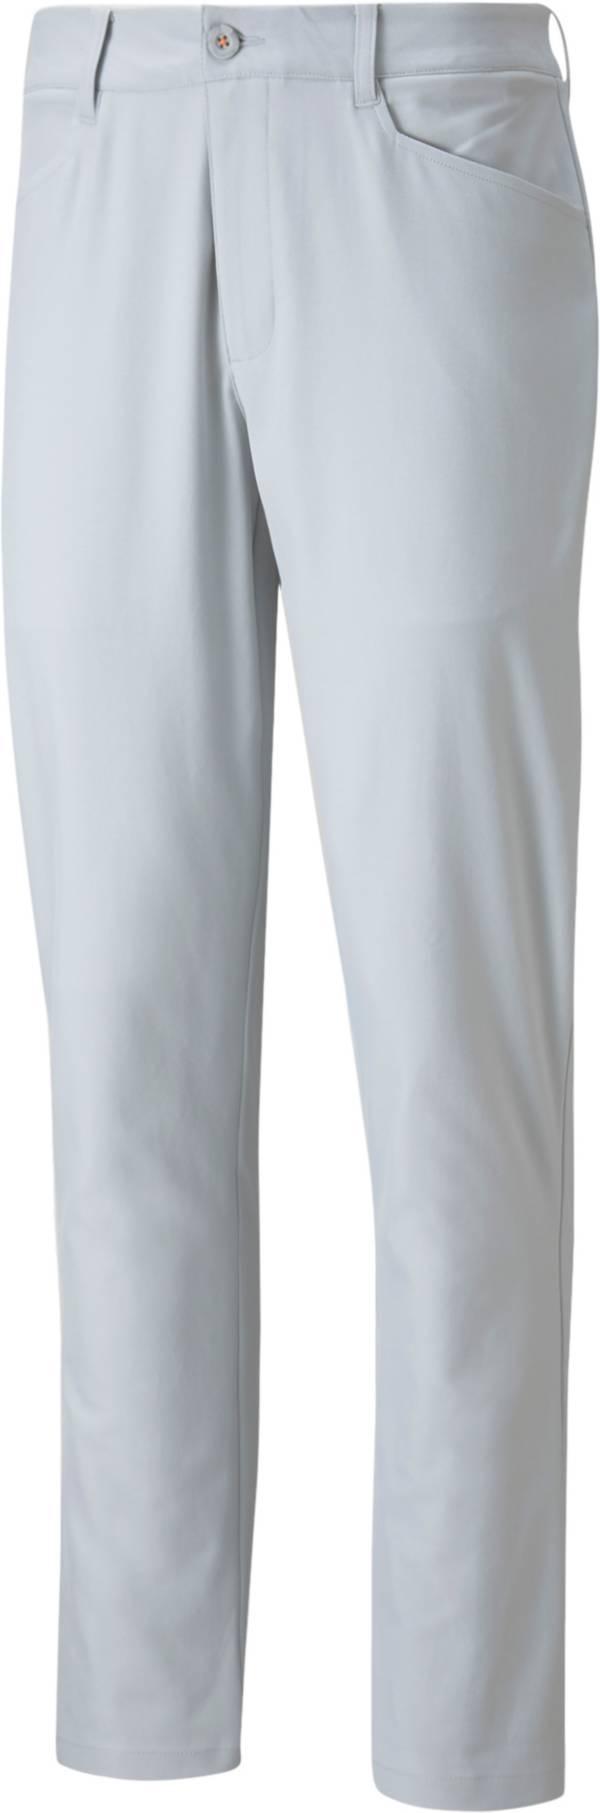 Puma Men's X Golf Pants product image